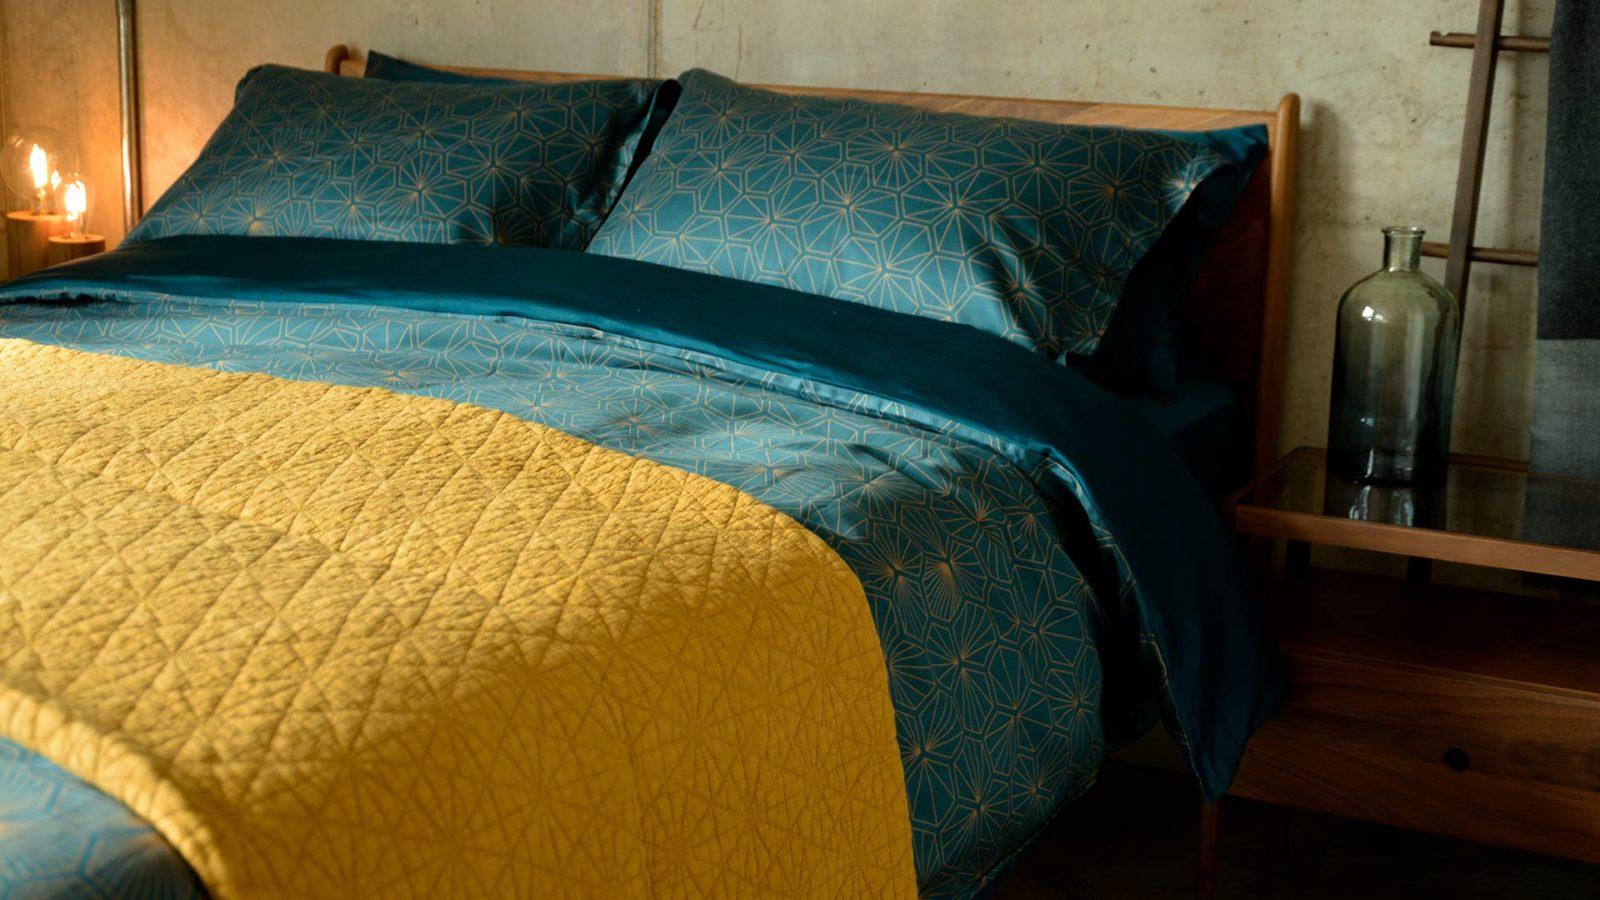 deep ochre bedspread